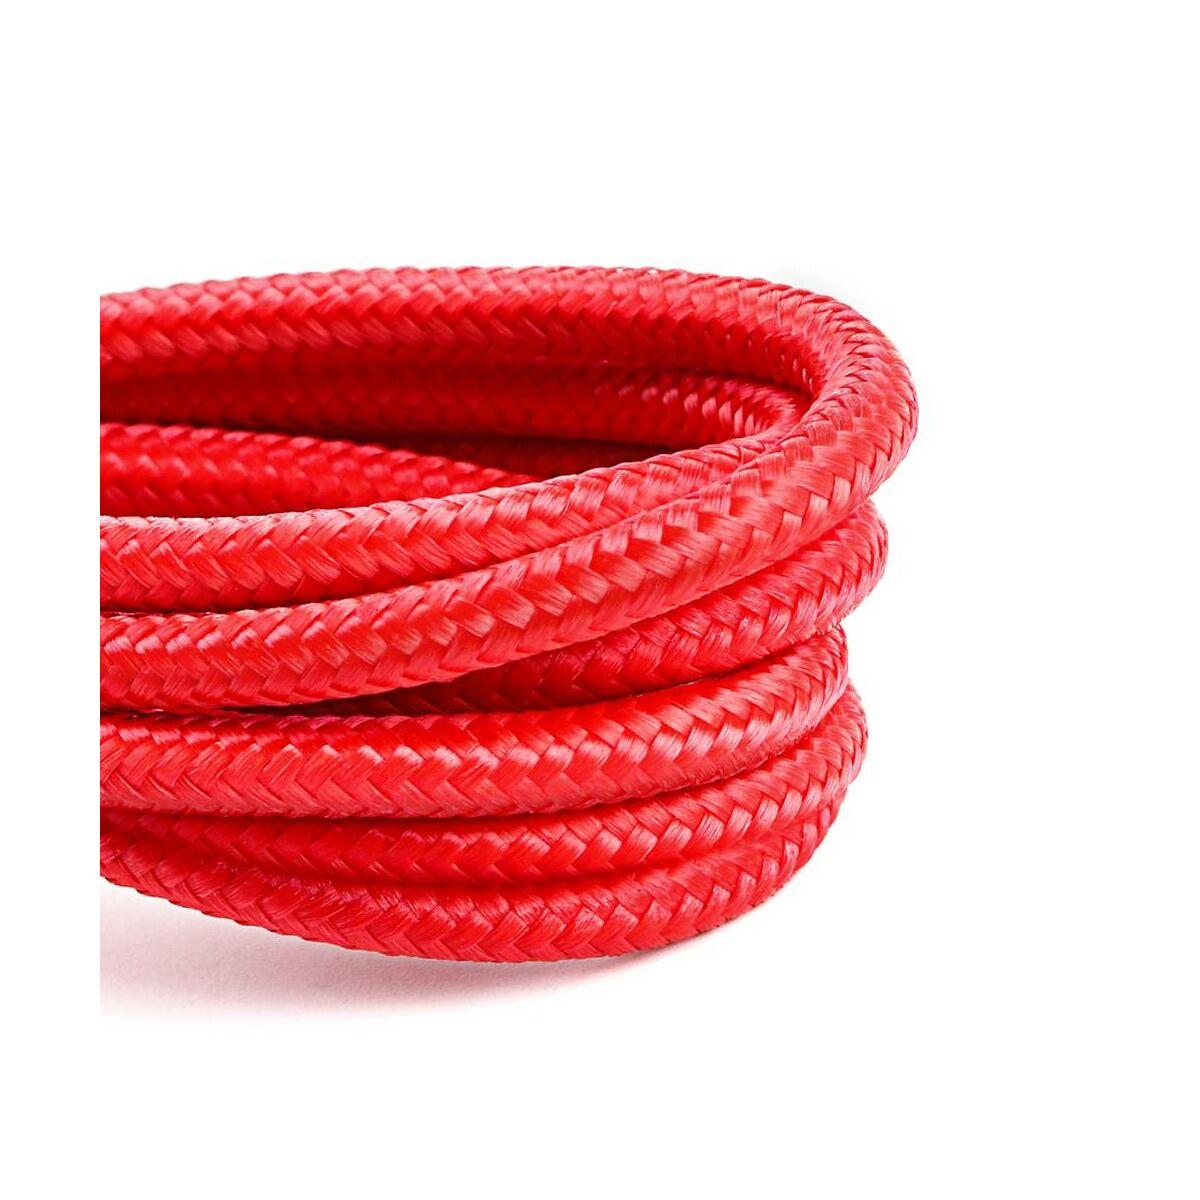 Baseus Lightning Cafule kábel, 2A, 3m, piros/piros (CALKLF-R09)